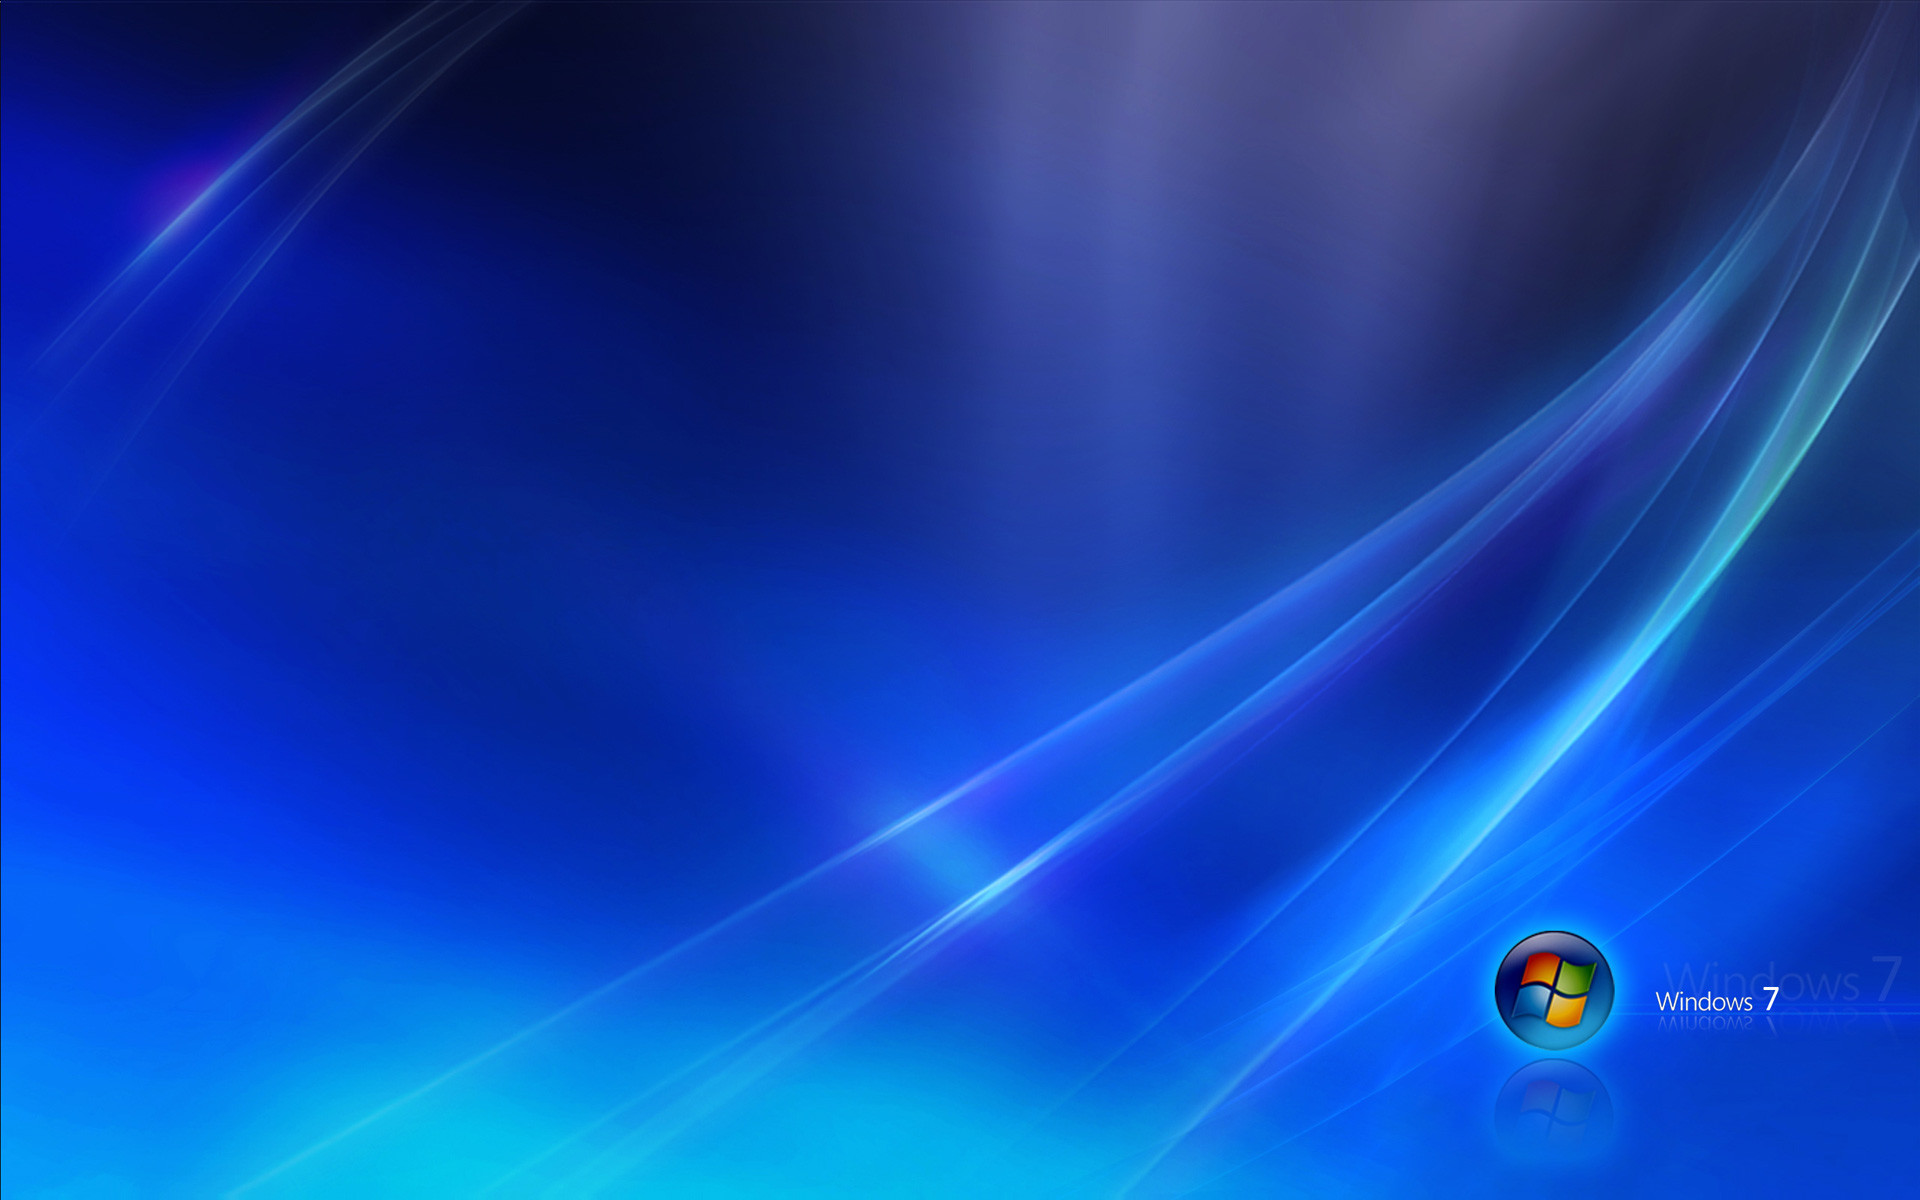 Computers – Windows 7 Aurora Blue Wallpaper – Free Desktop .